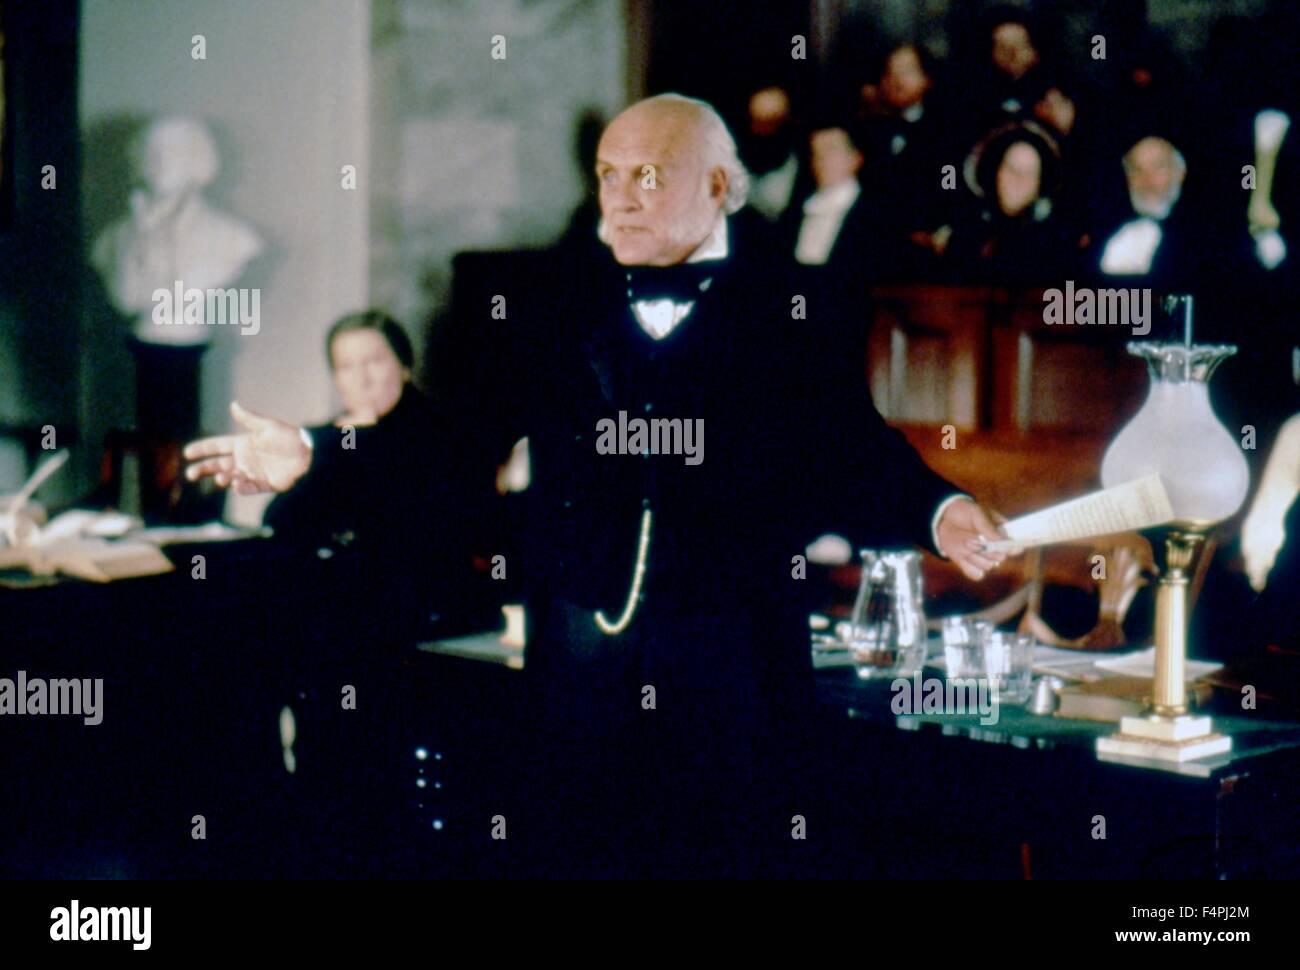 Anthony Hopkins / Amistad / 1997 dirigida por Steven Spielberg [Dreamworks Pictures] Imagen De Stock